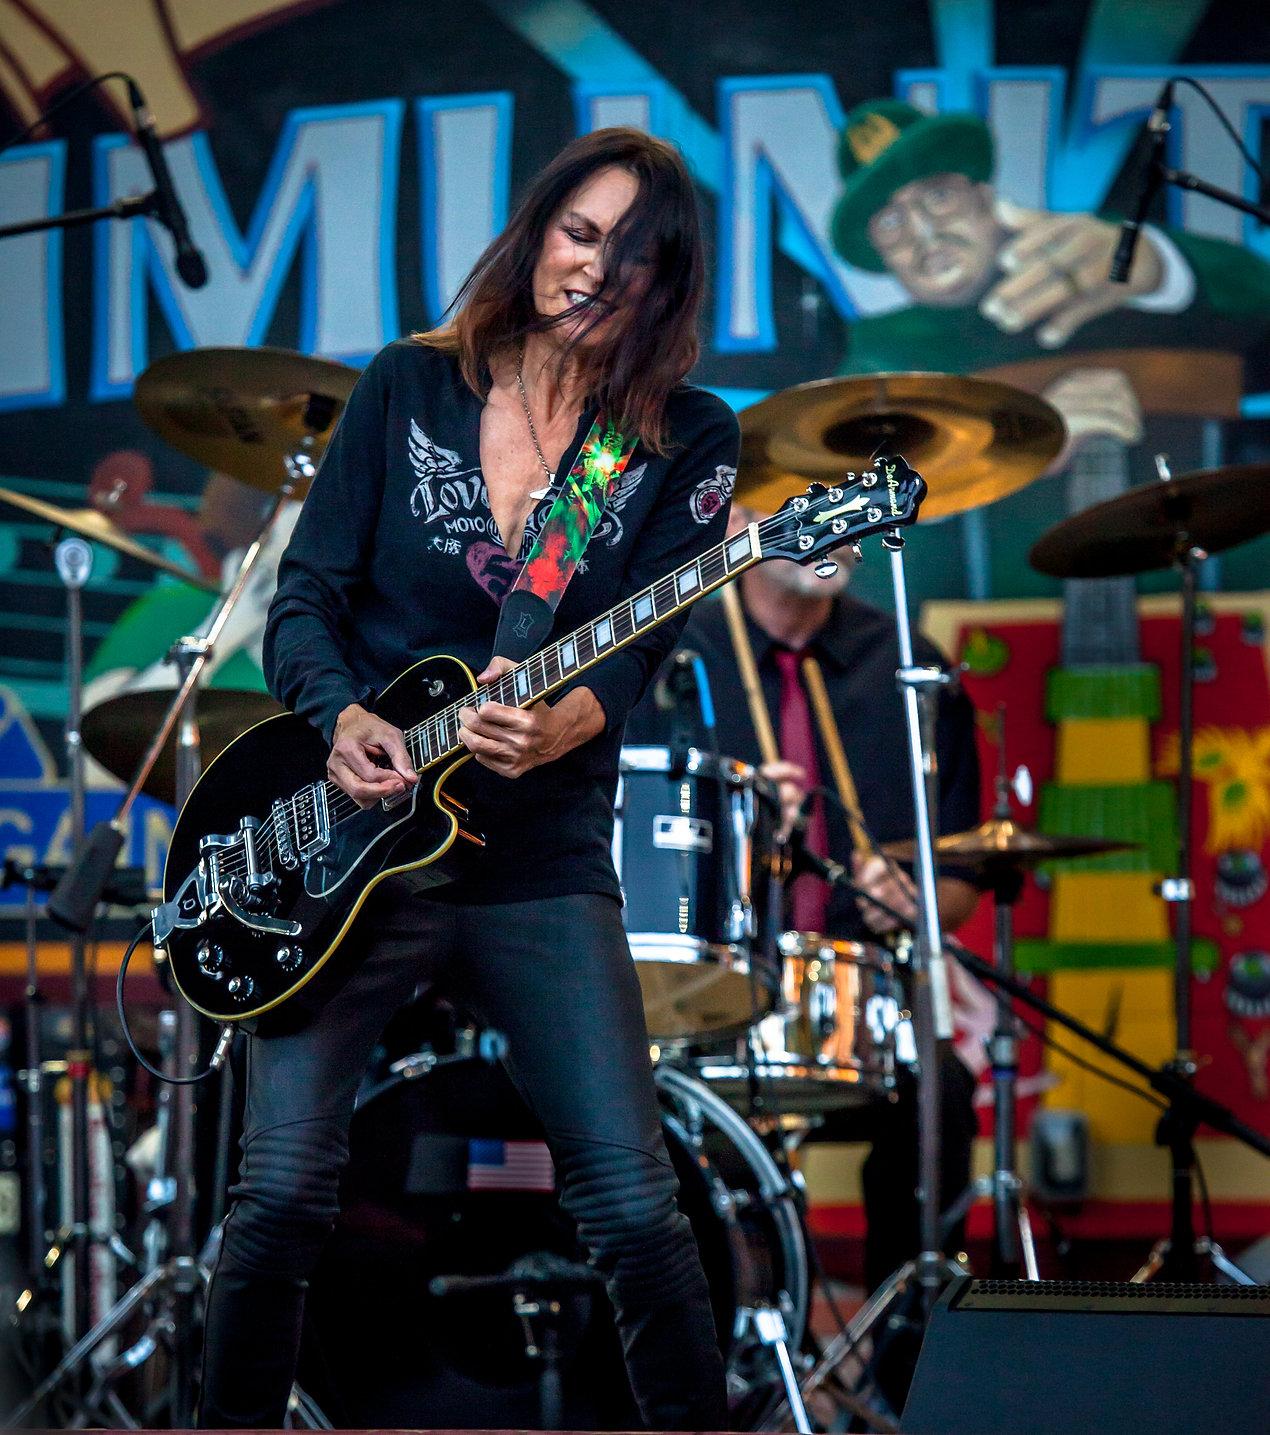 Nancy Luca Los Angeles based rock musician, lead guitarist at Paris Opera house